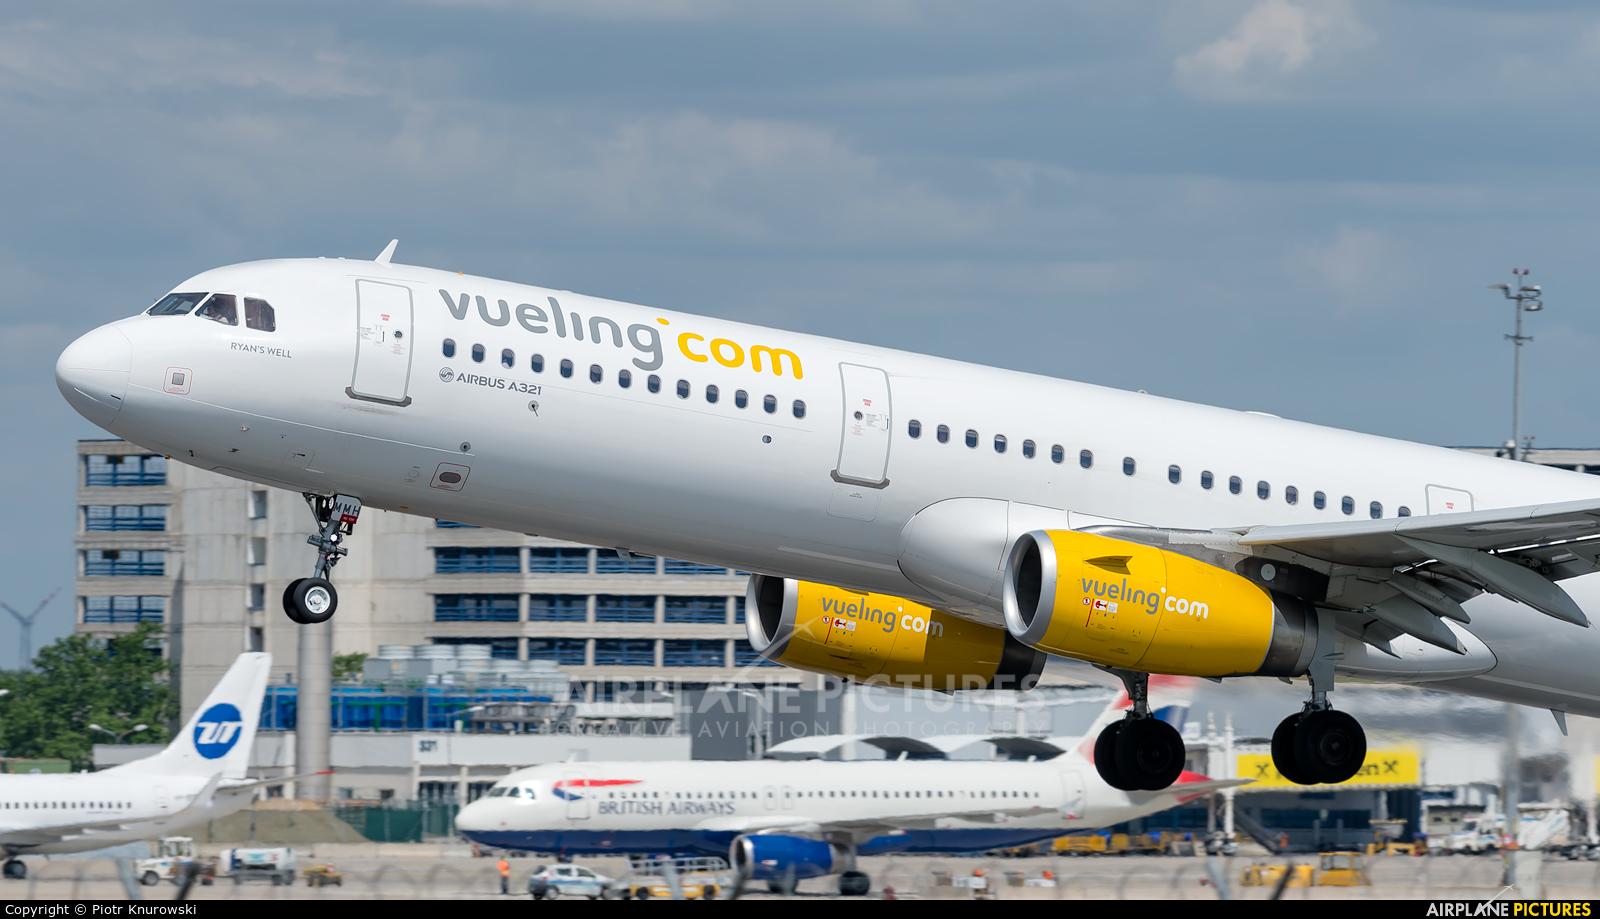 Vueling Airlines EC-MMH aircraft at Vienna - Schwechat